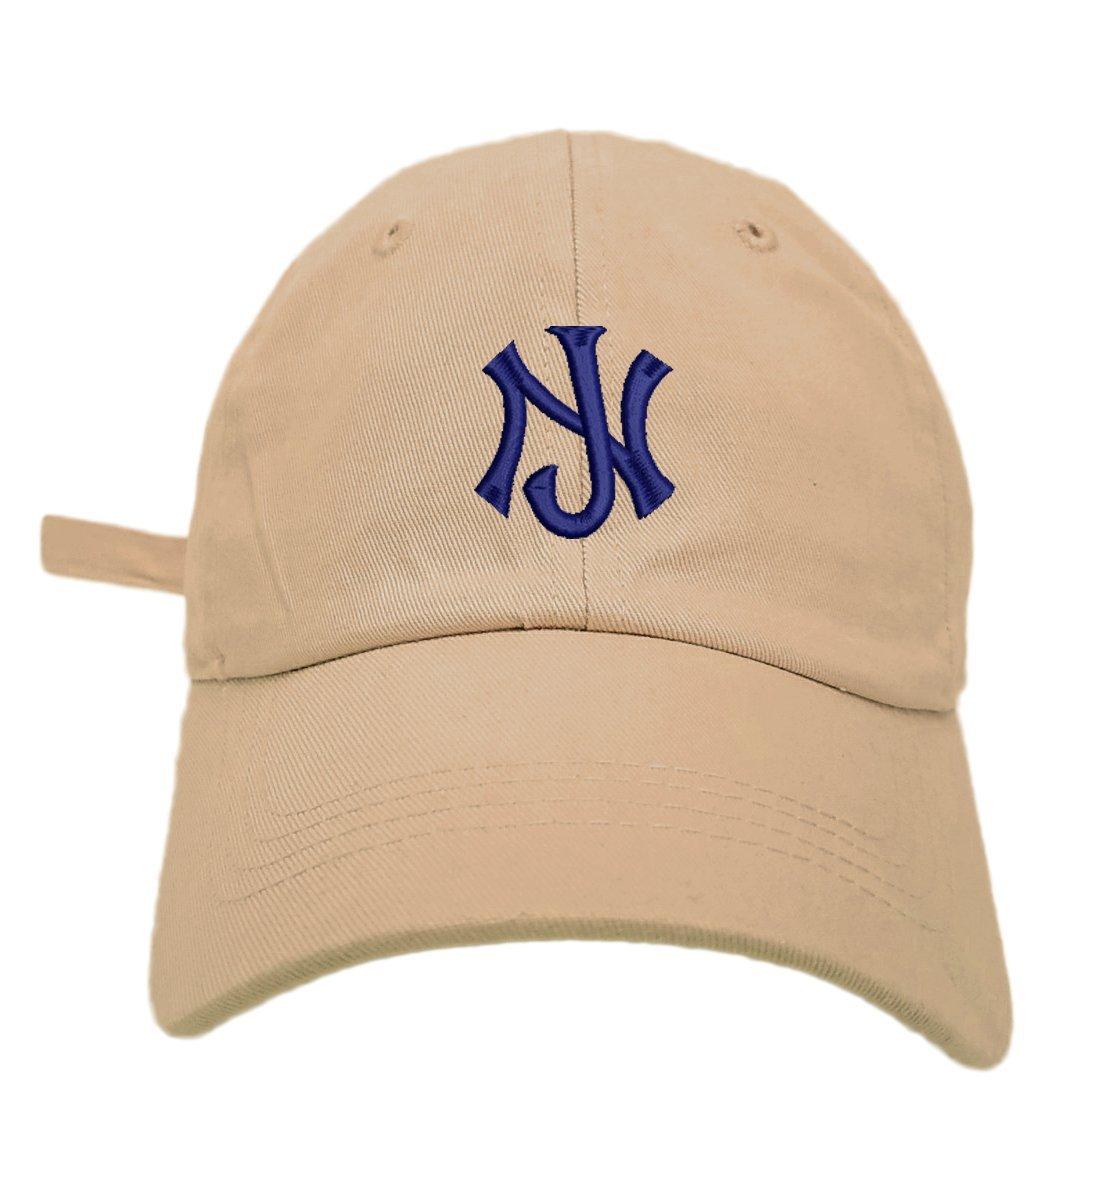 TheMonsta New Jersey Logo Style Dad Hat Washed Cotton Polo Baseball Cap (Khaki)